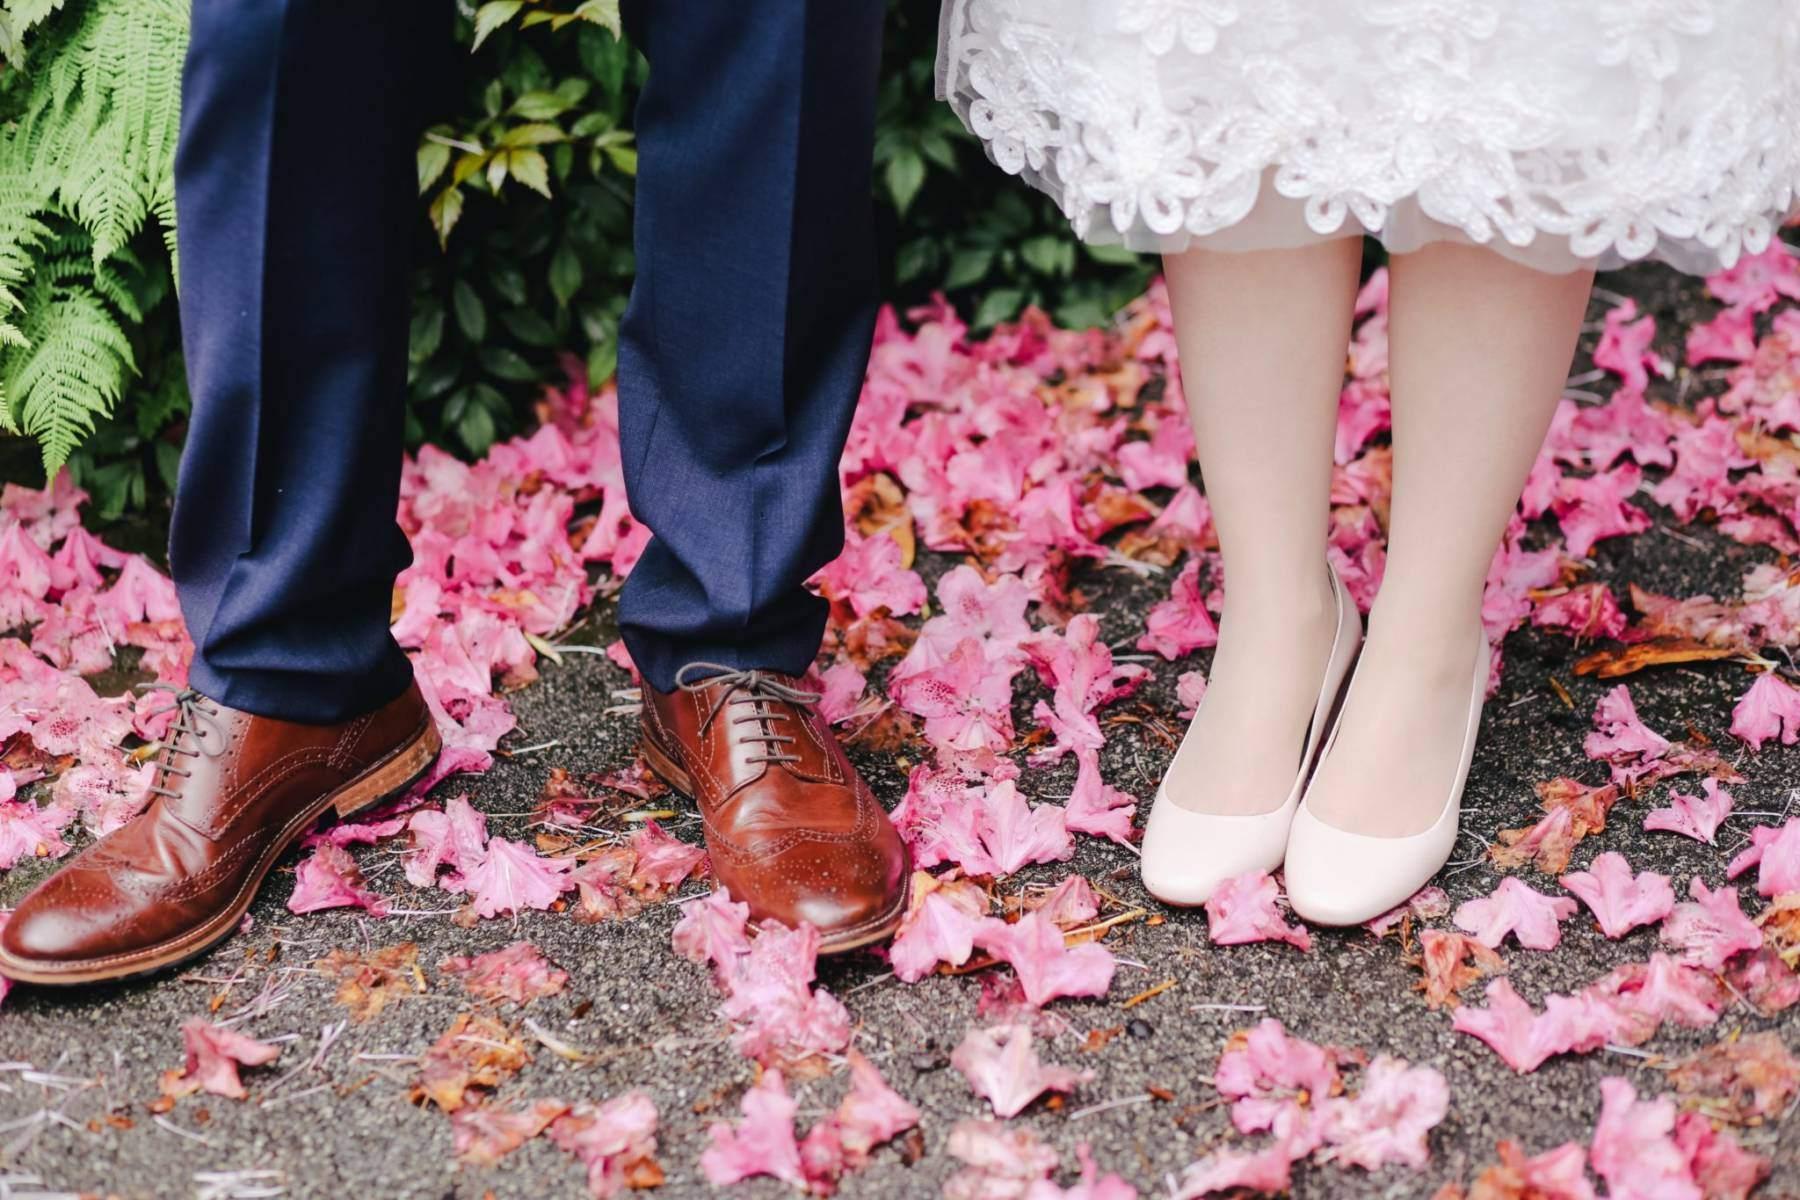 Zadbane stopy panny młodej podologia